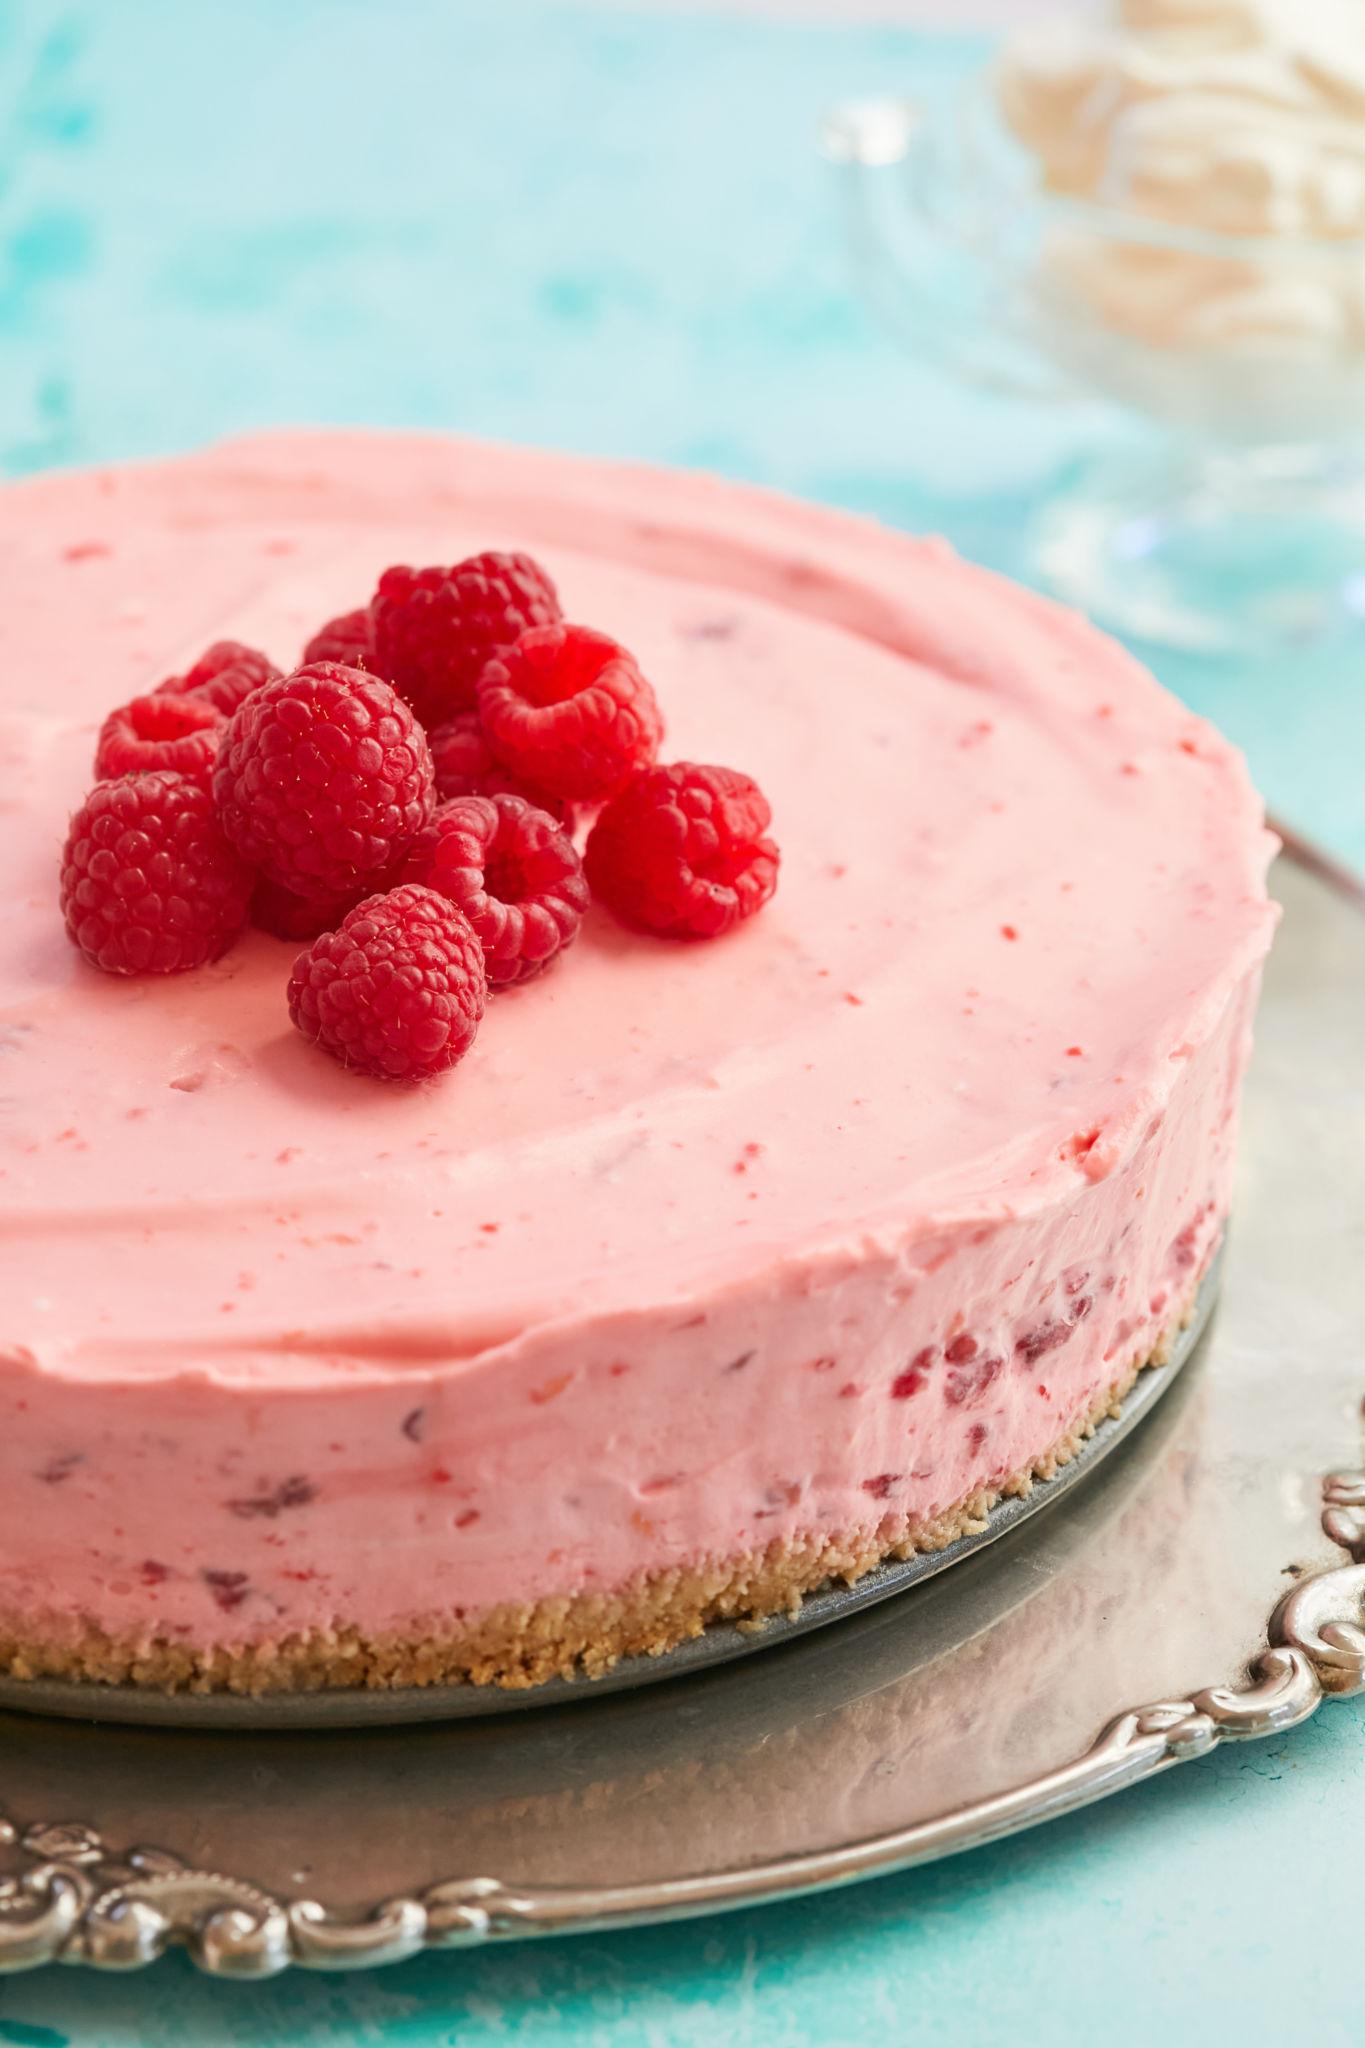 My No-Bake Raspberry Cheesecake, topped with raspberries.